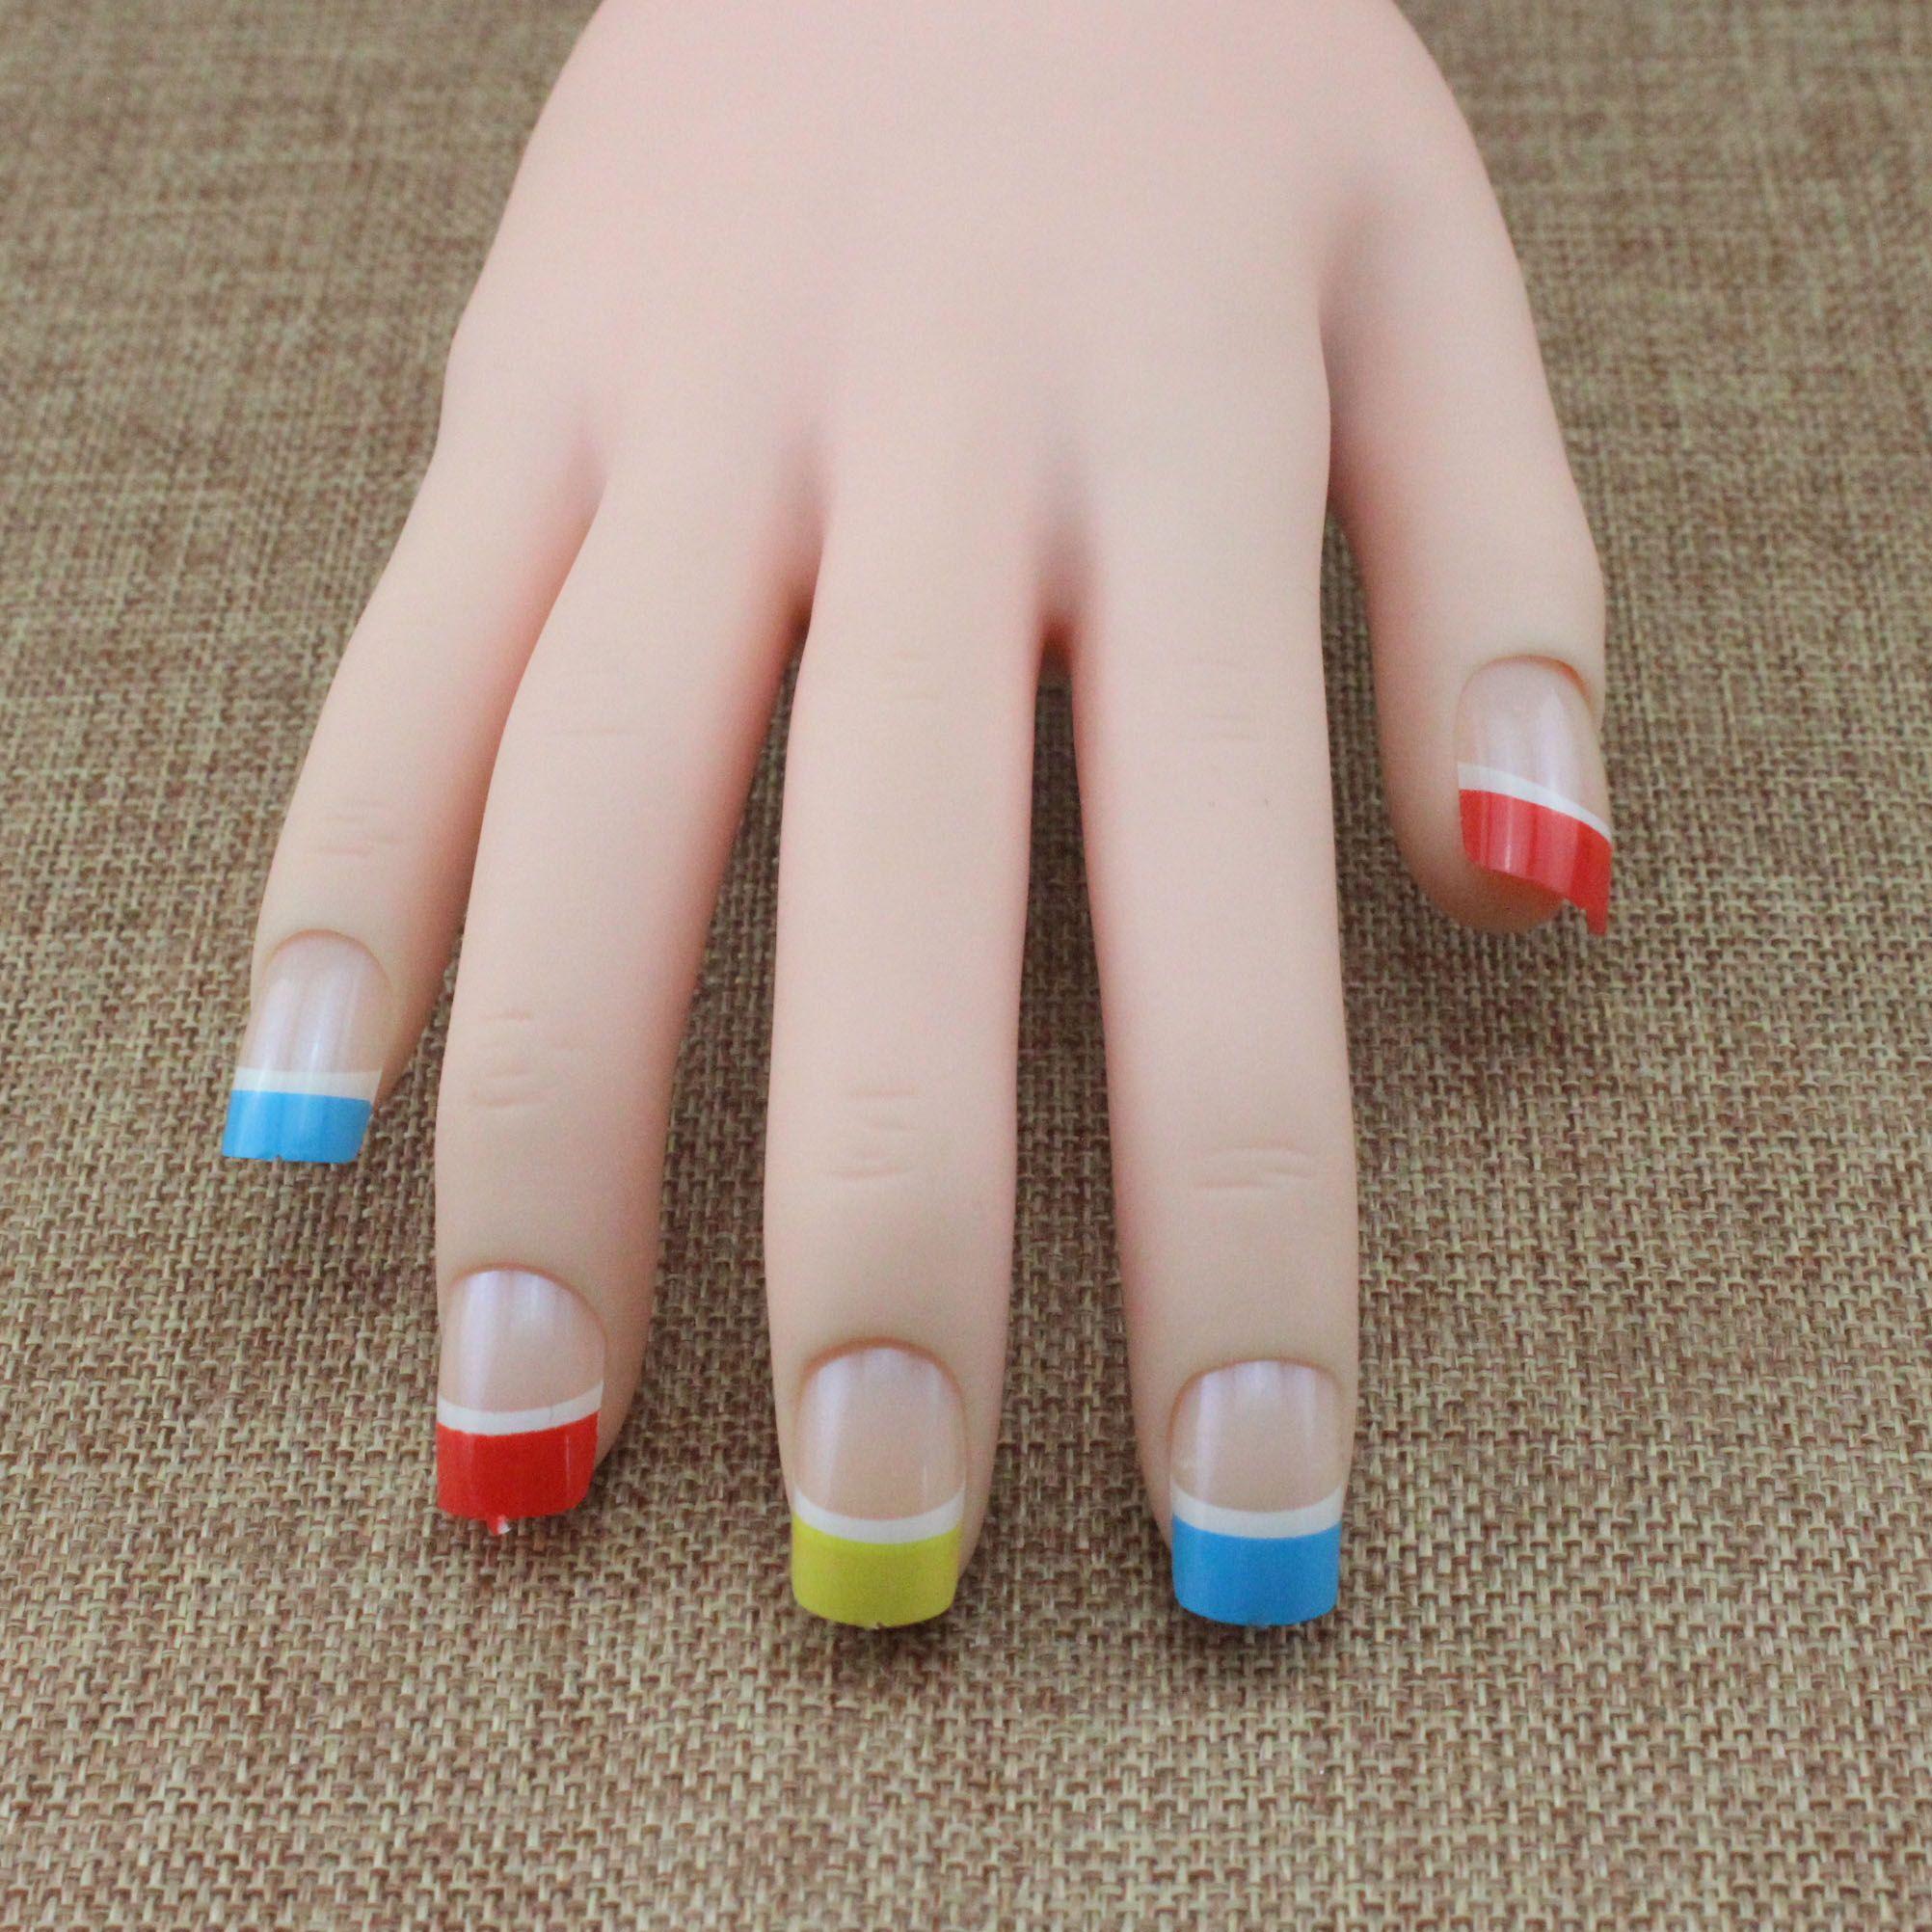 Fake Nails With 2g Glue Uv Gel Art Decorations False Nails Decoracao ...